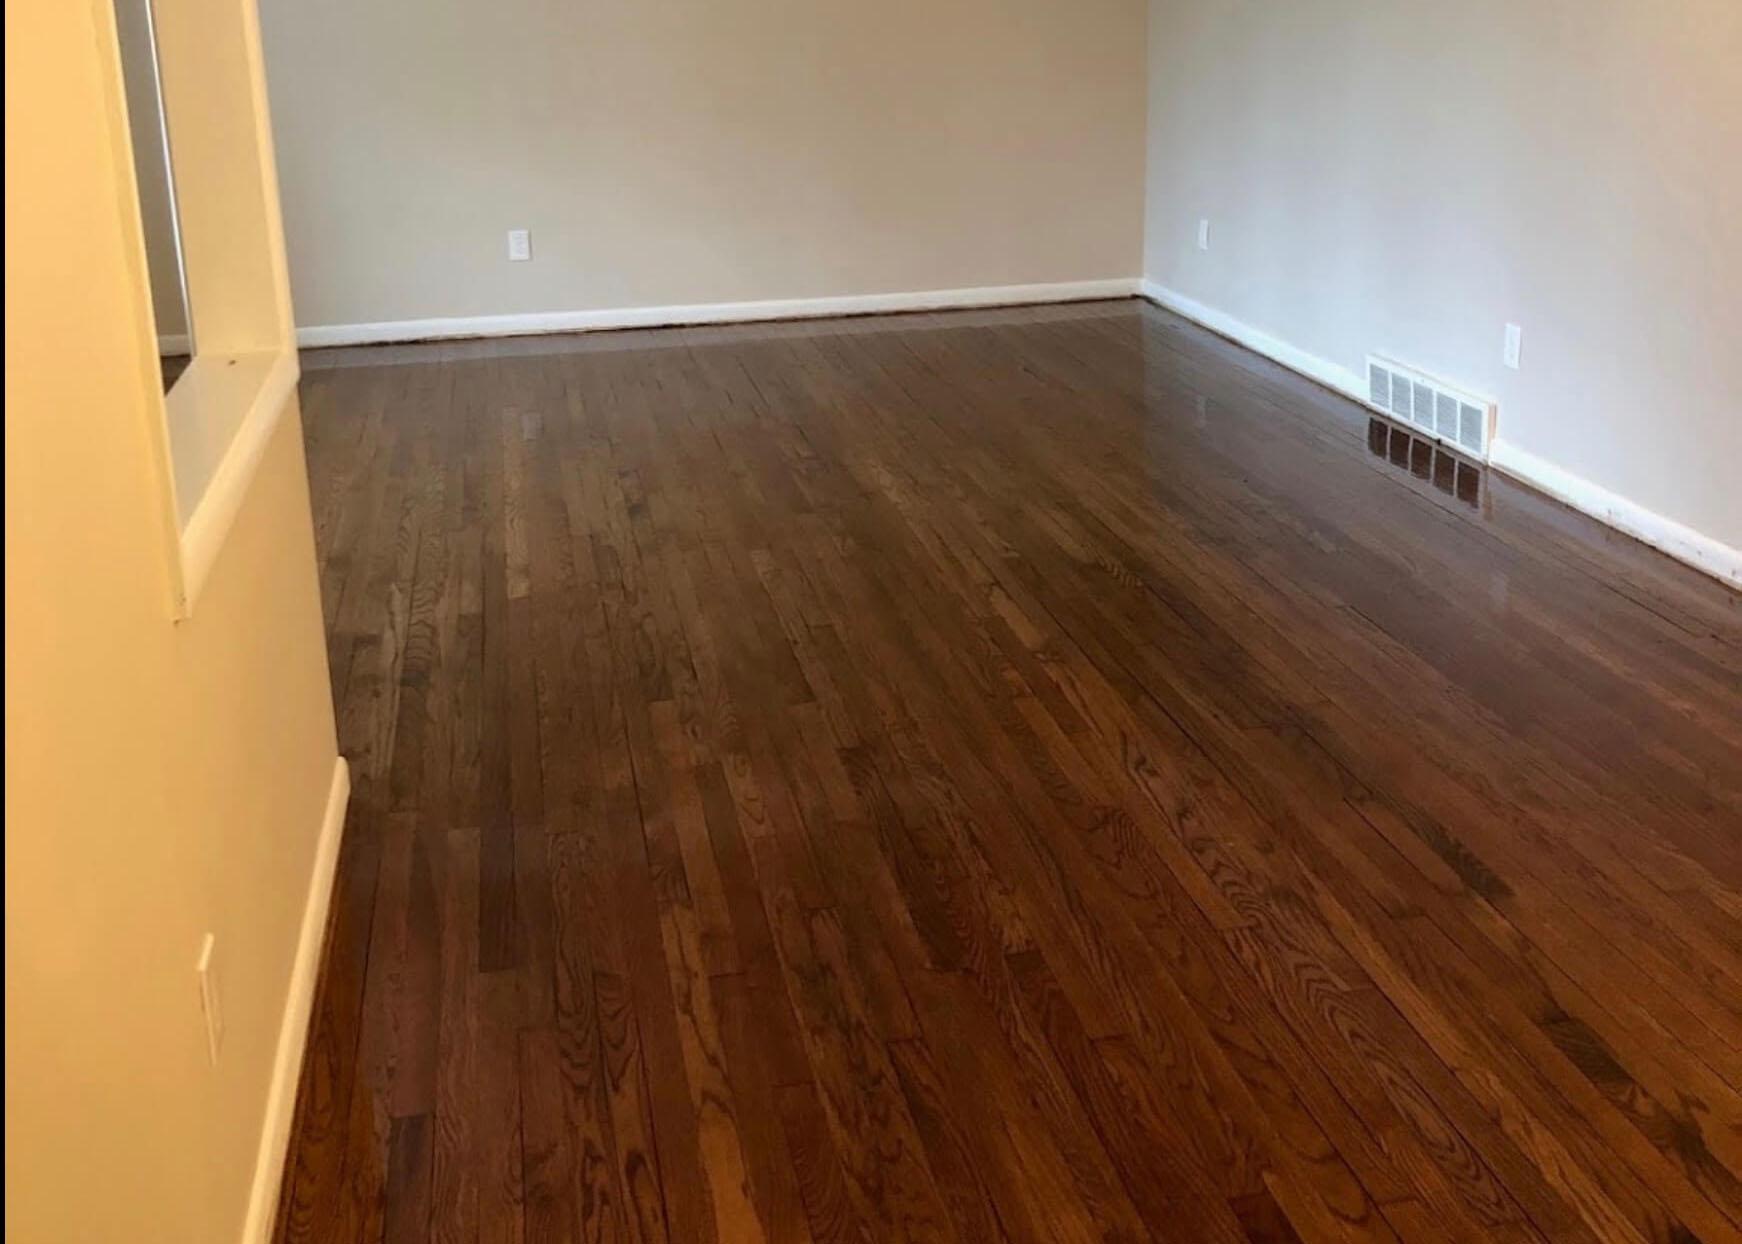 hardwood floor refinishing charleston